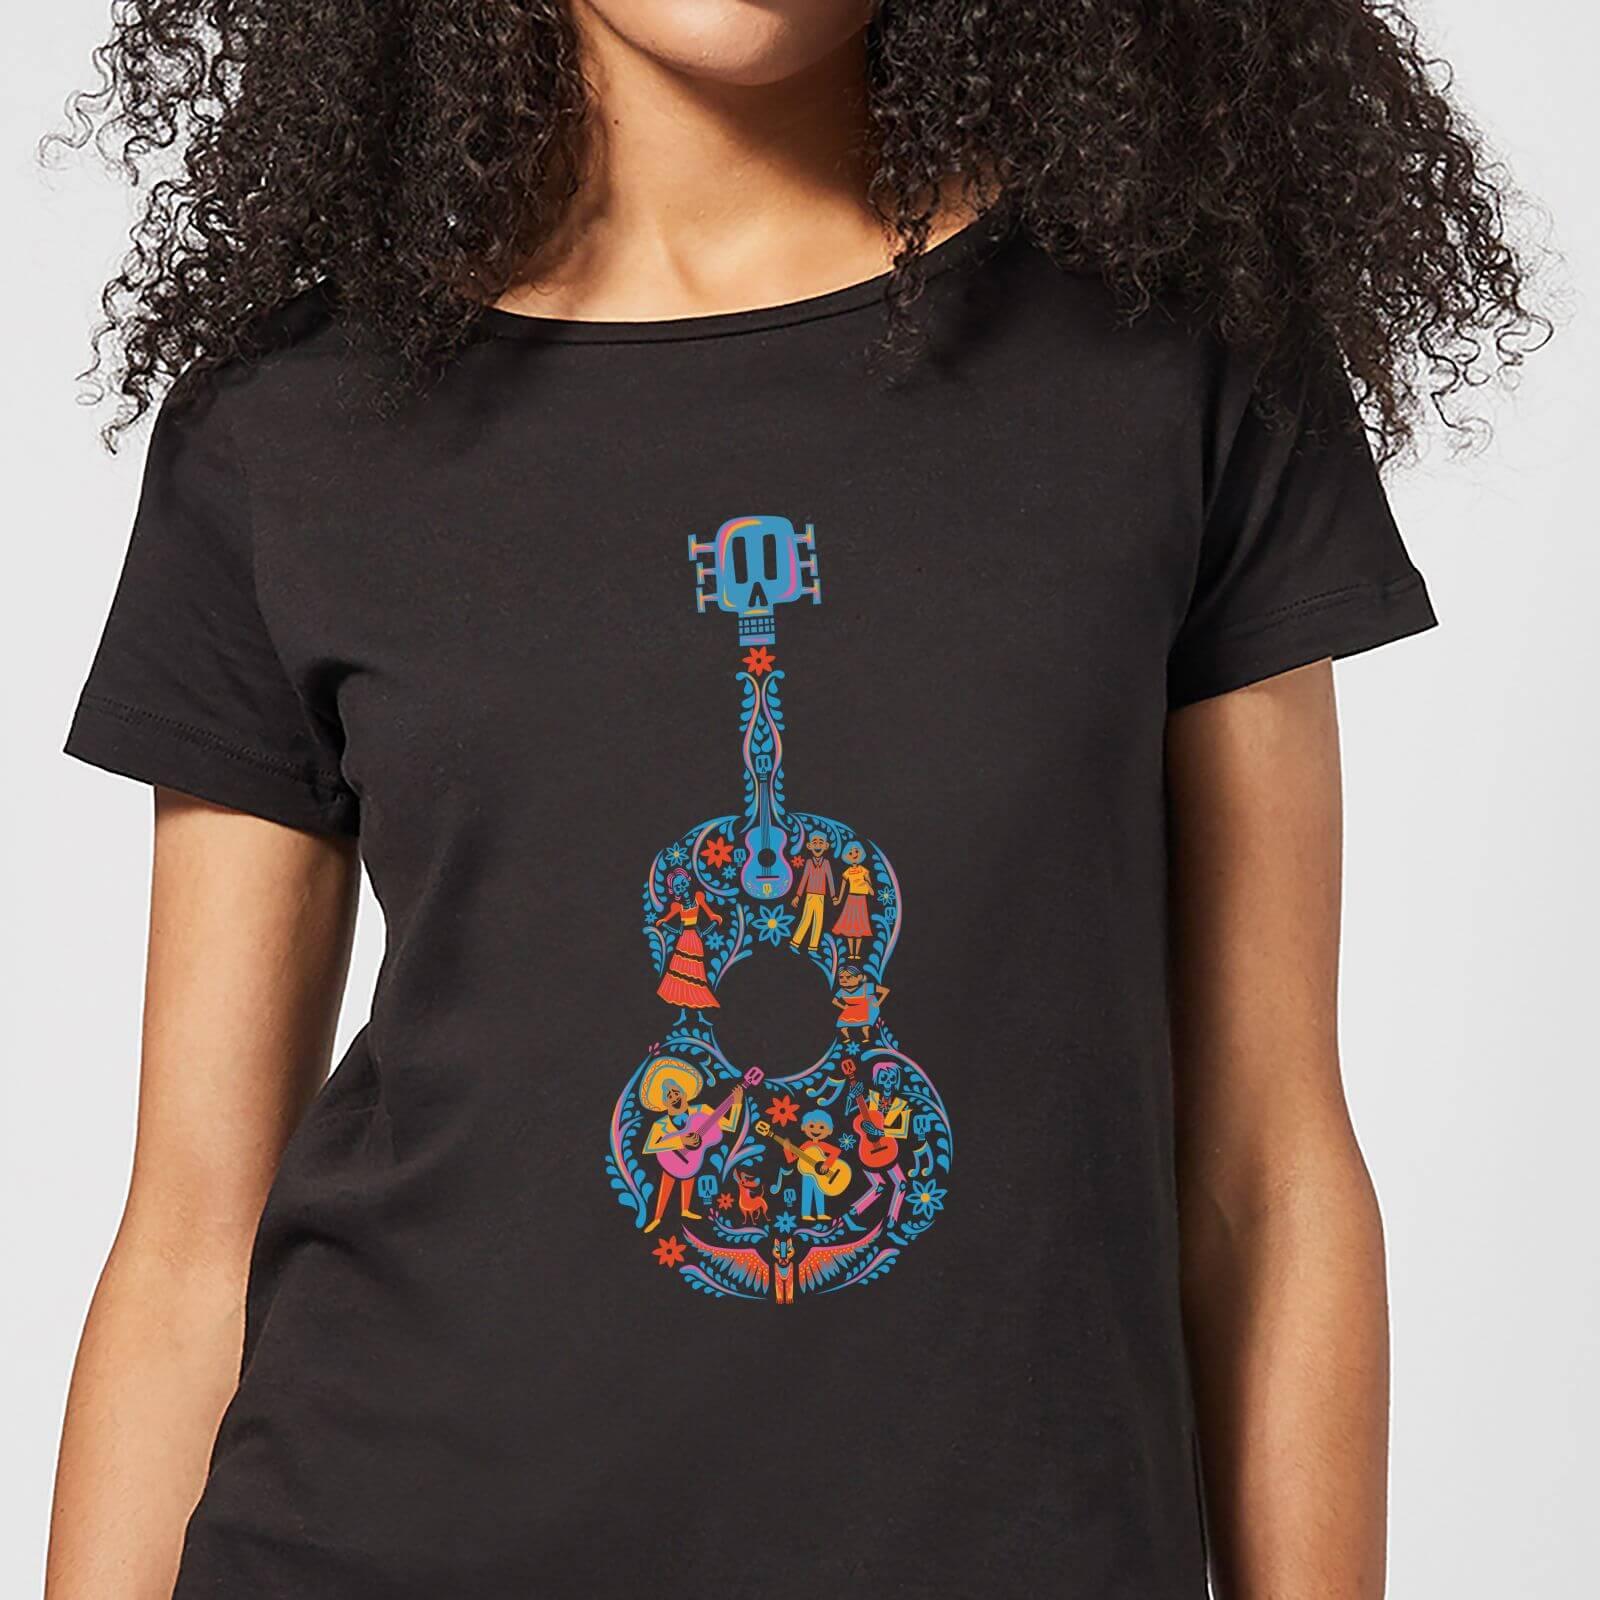 Disney Coco Guitar Pattern Women's T-Shirt - Black - XXL - Black